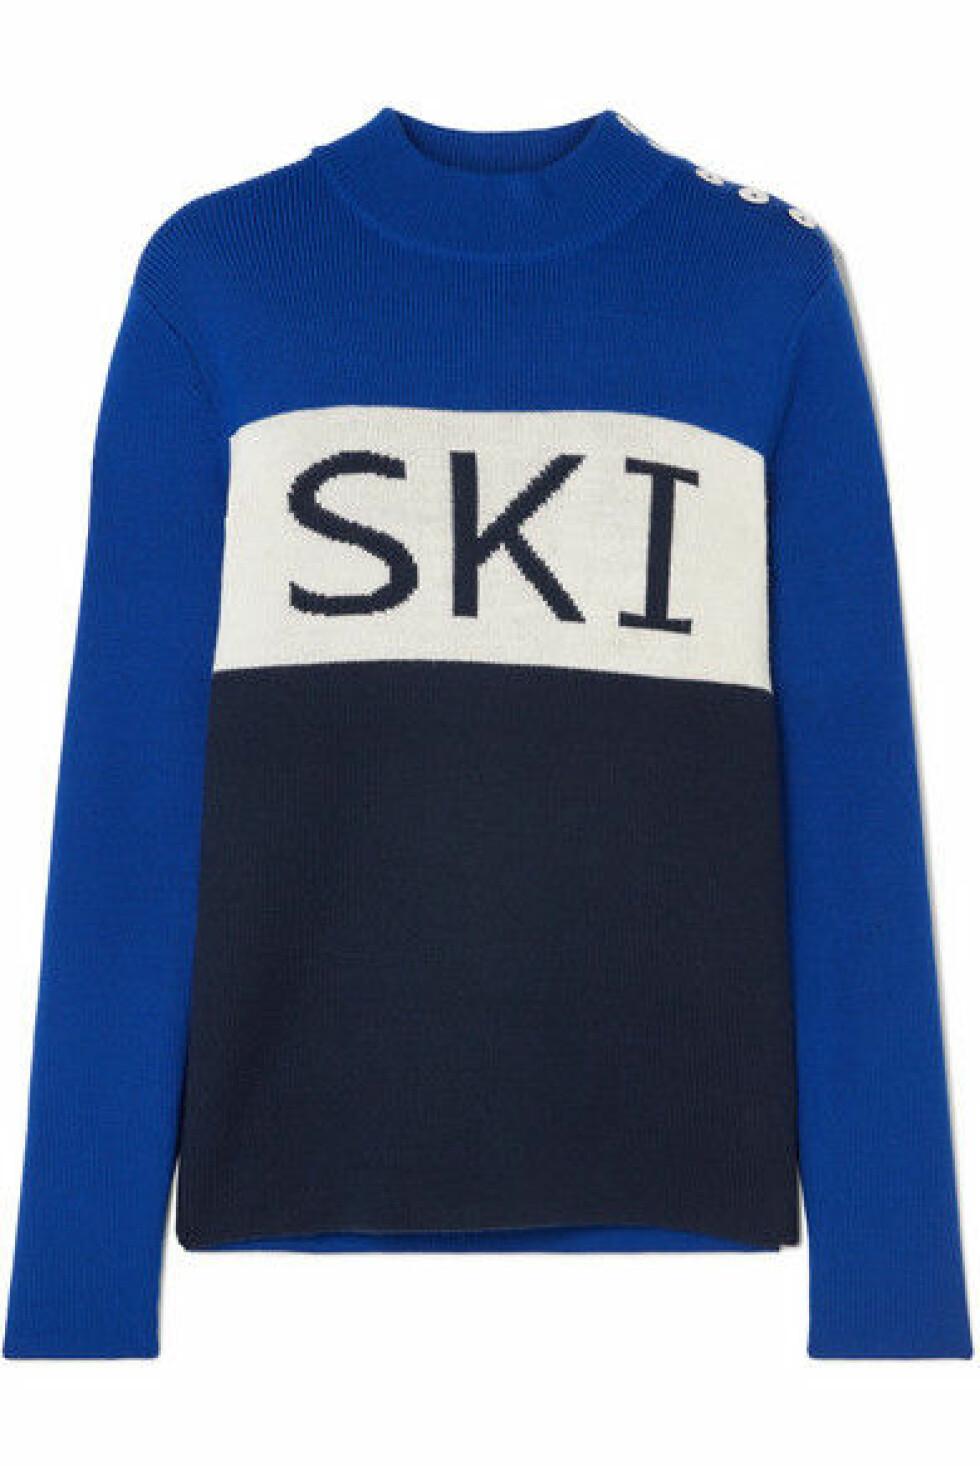 Genser fra Tory Sport |3000,-| https://www.net-a-porter.com/no/en/product/1066358/tory_sport/button-embellished-intarsia-merino-wool-blend-sweater